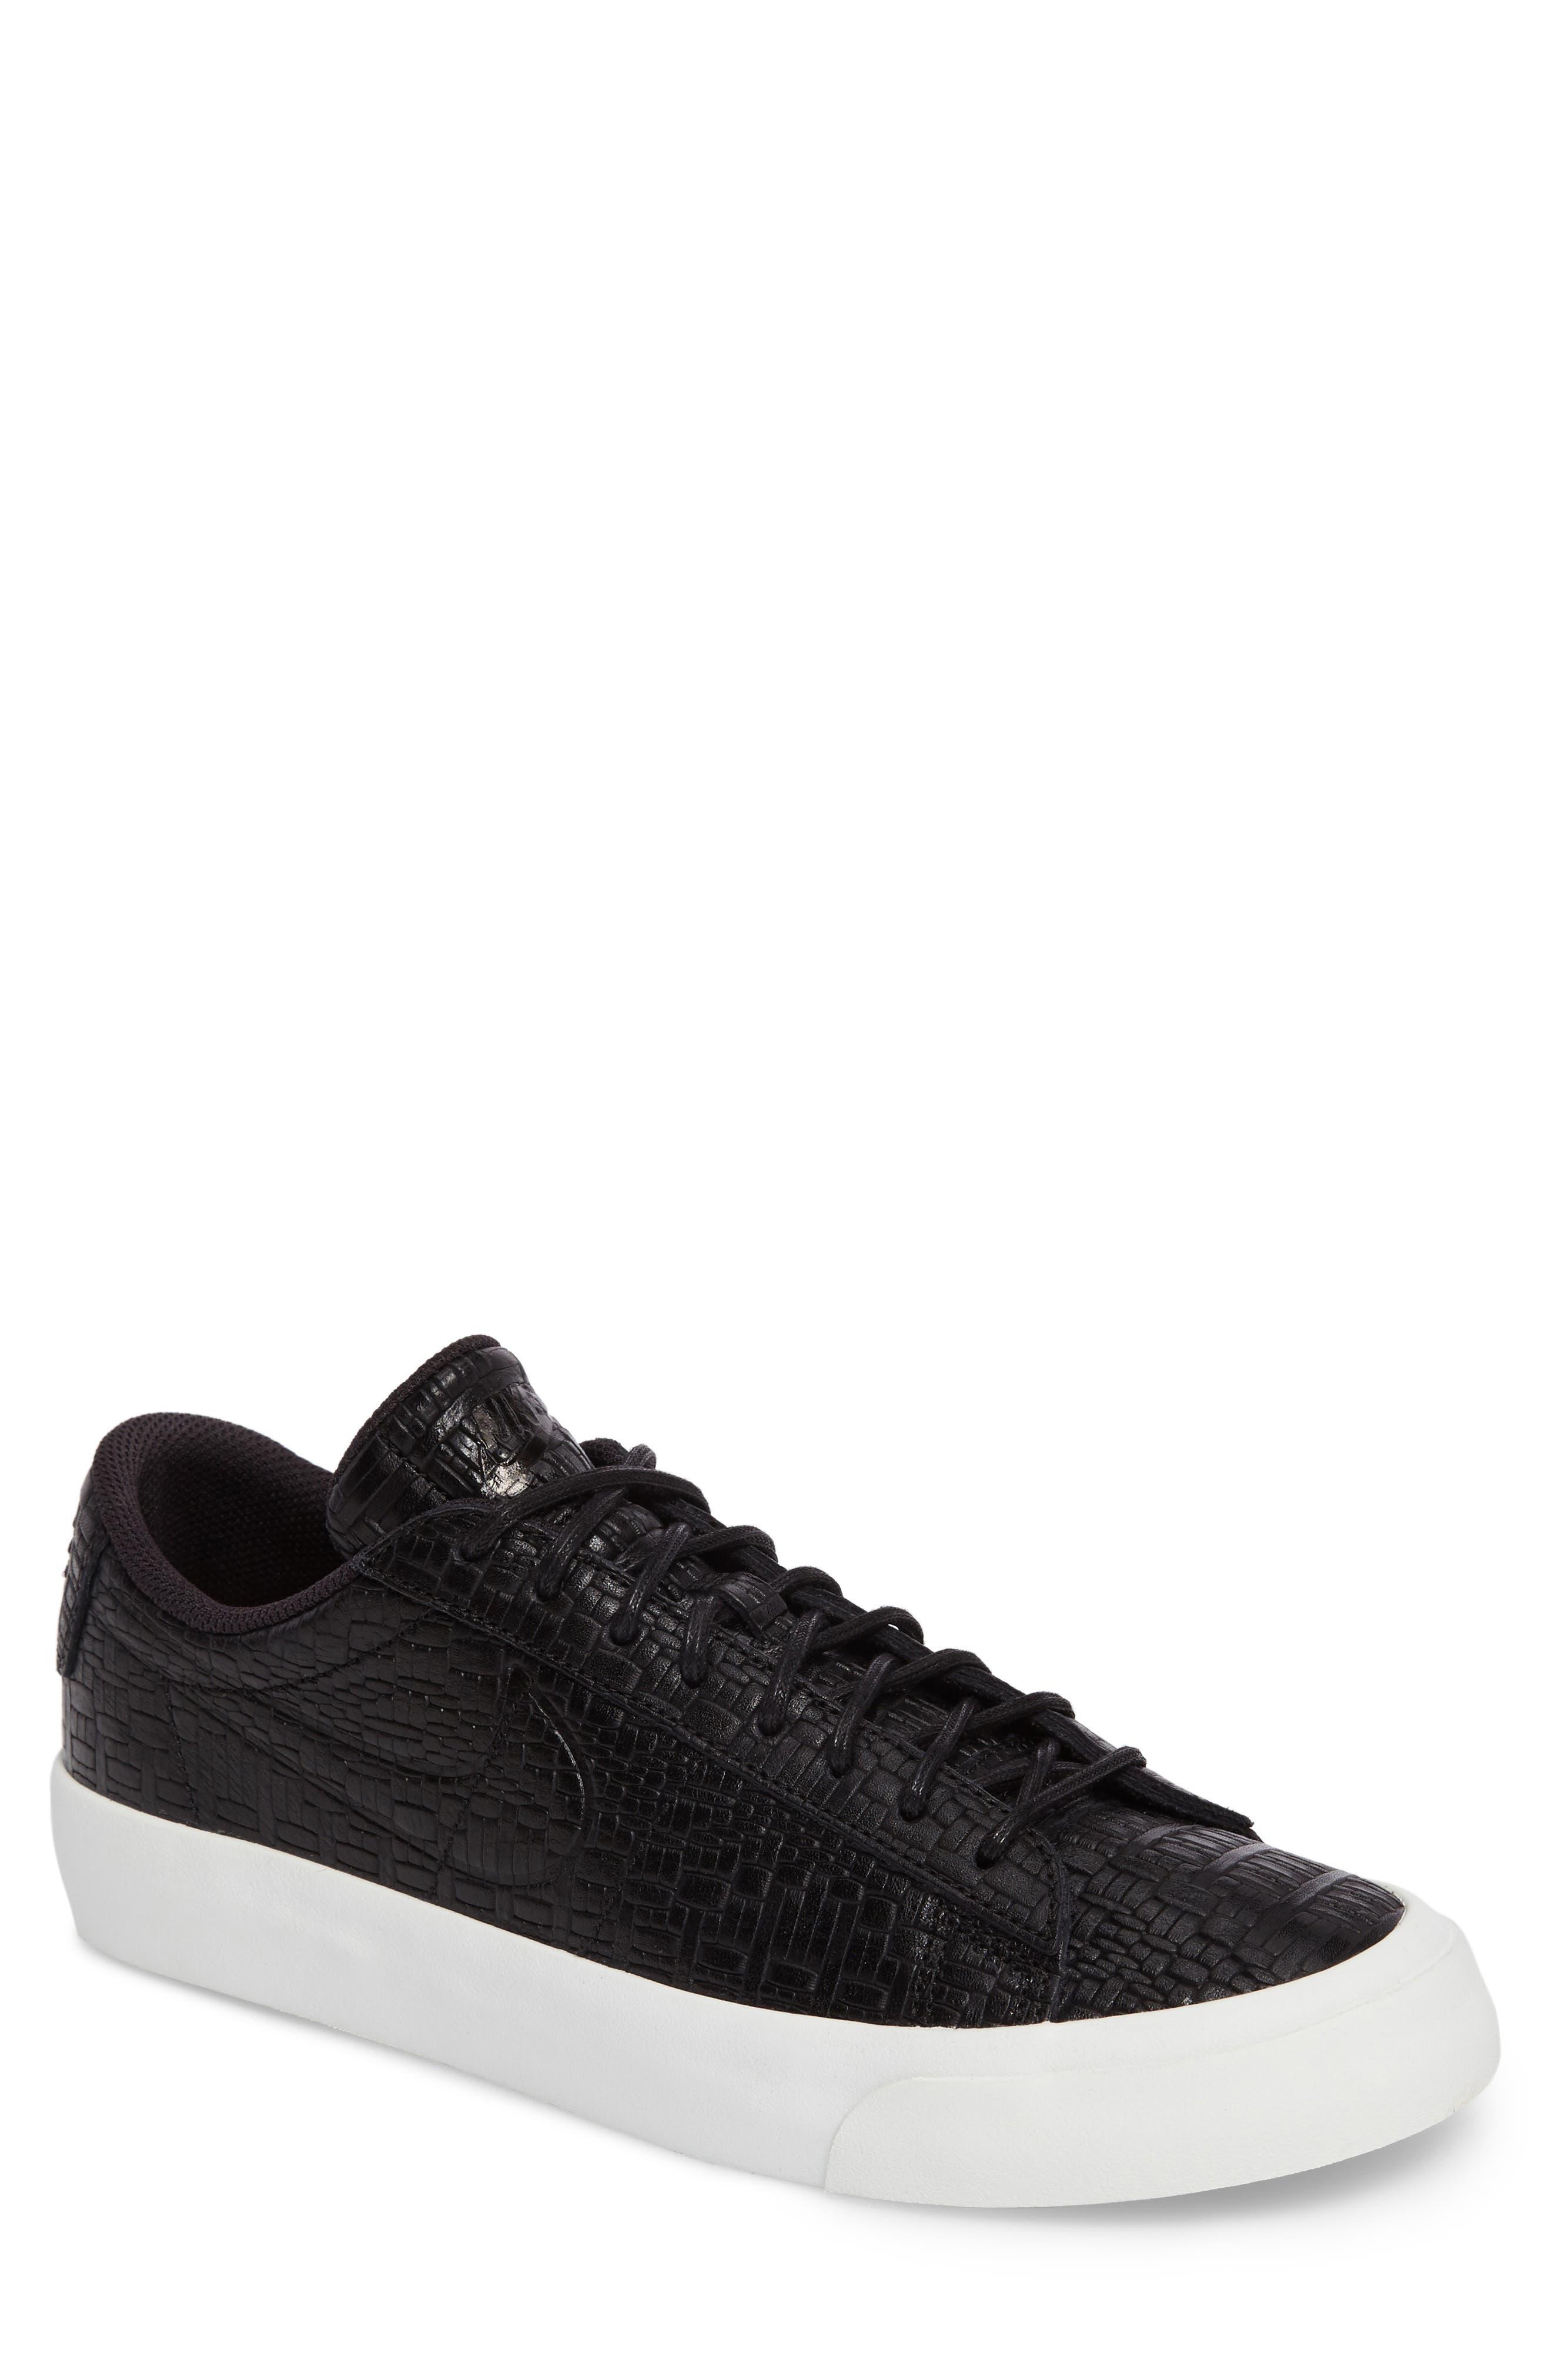 Blazer Studio Sneaker,                         Main,                         color, 001